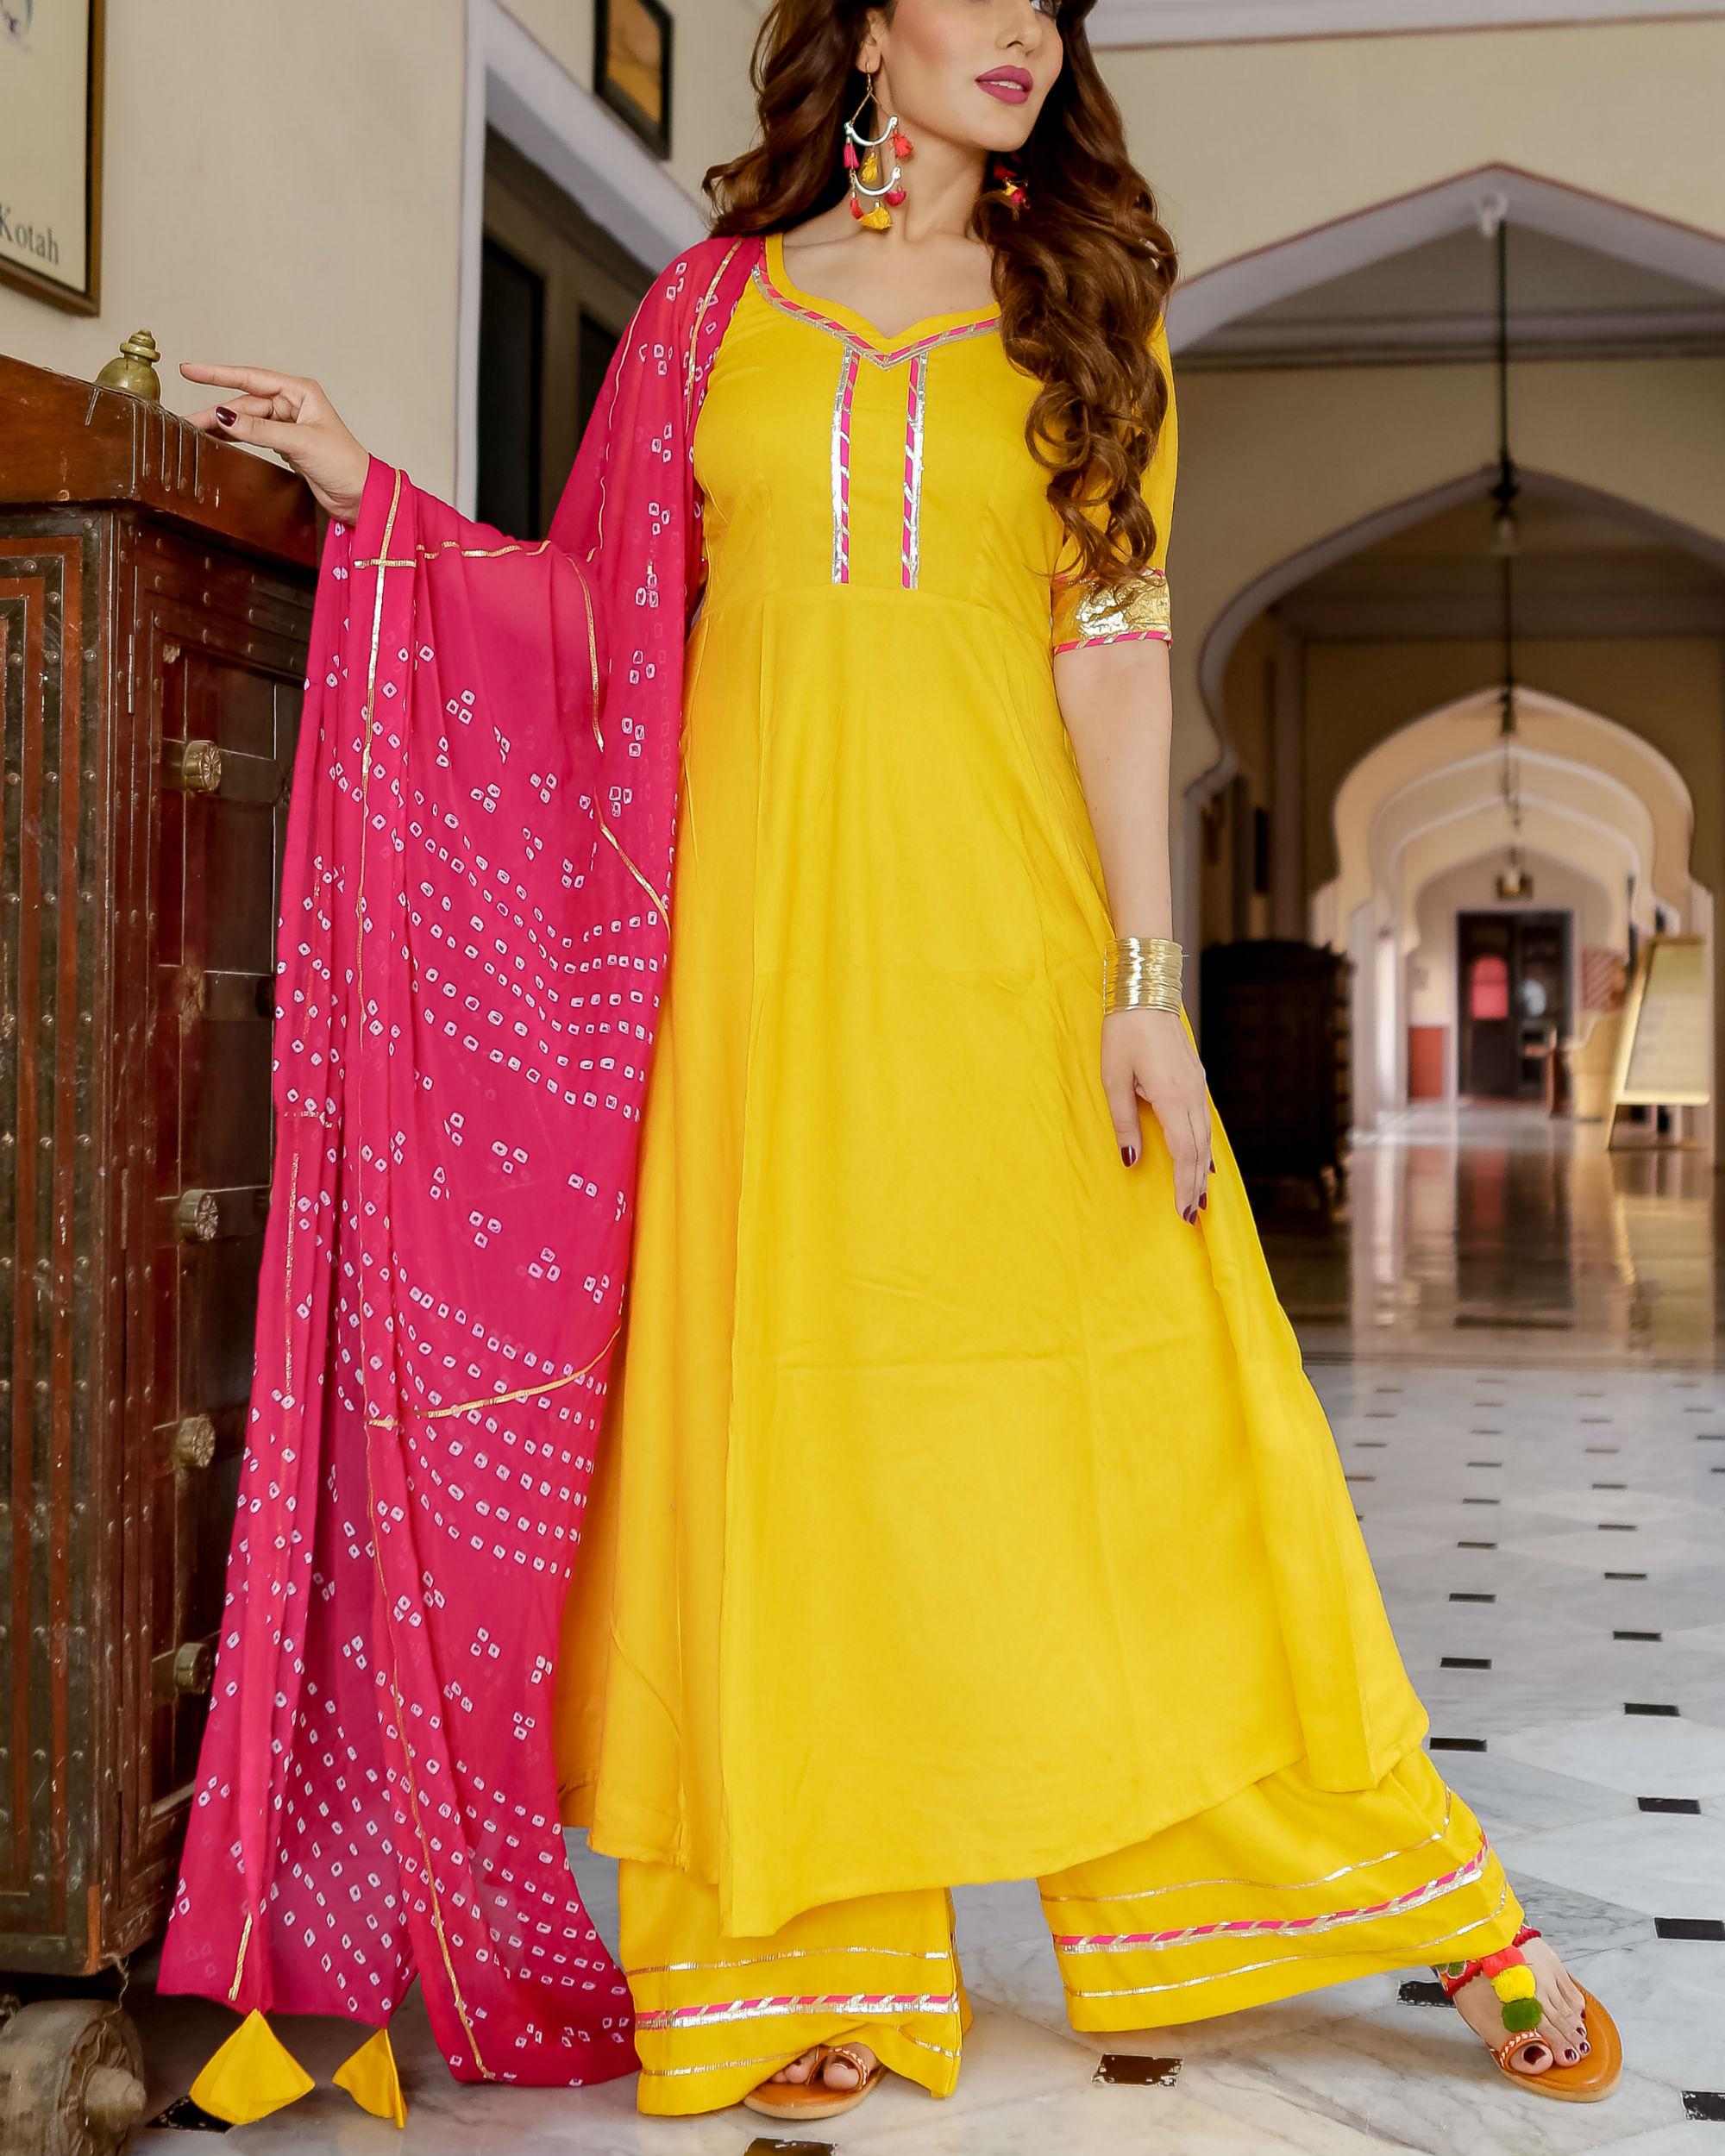 33d92669119 Yellow kurta set with bandhani dupatta by Aachho